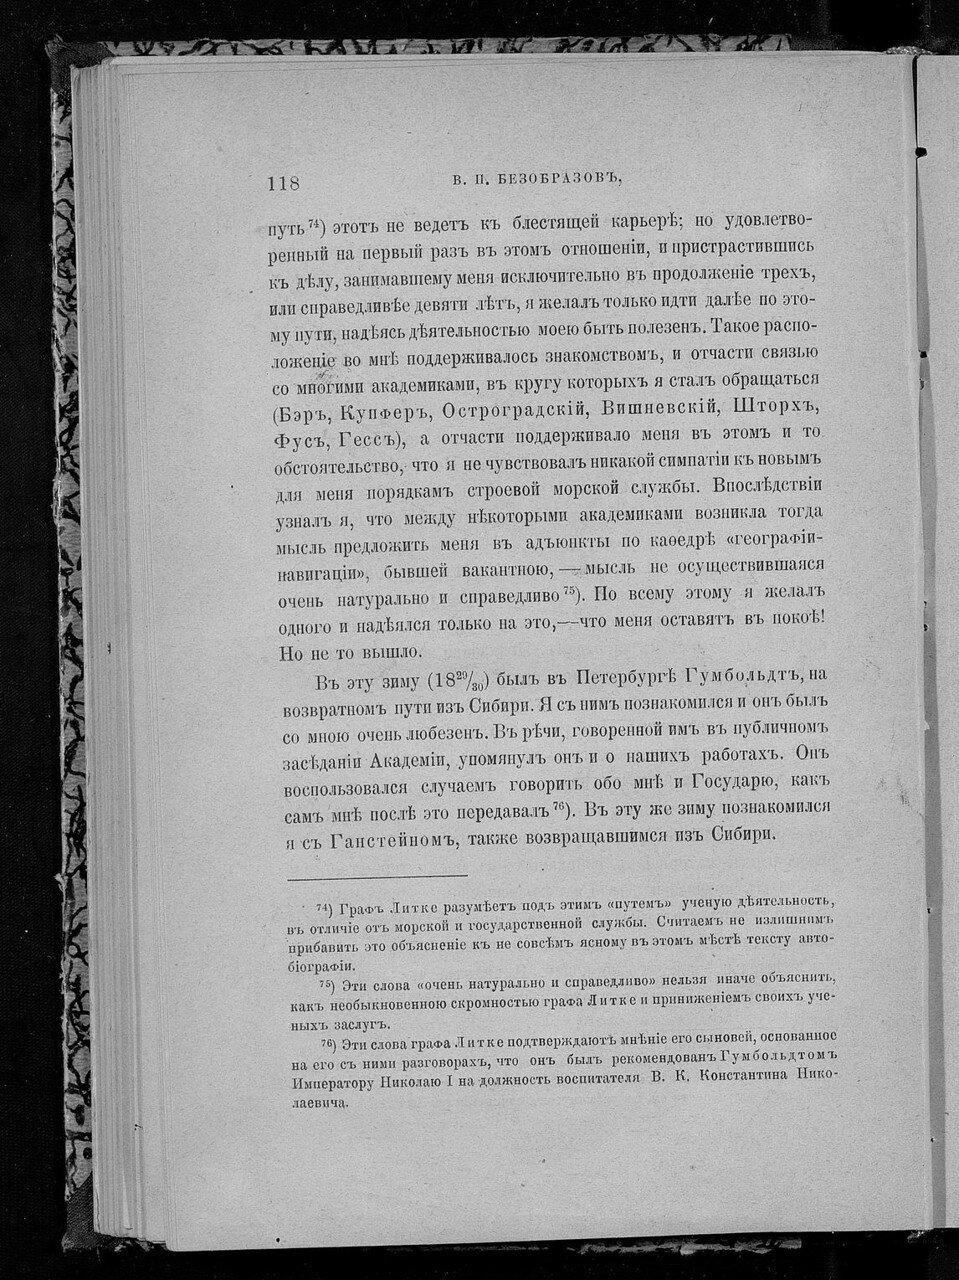 https://img-fotki.yandex.ru/get/931298/199368979.d5/0_21de15_799fc3c9_XXXL.jpg